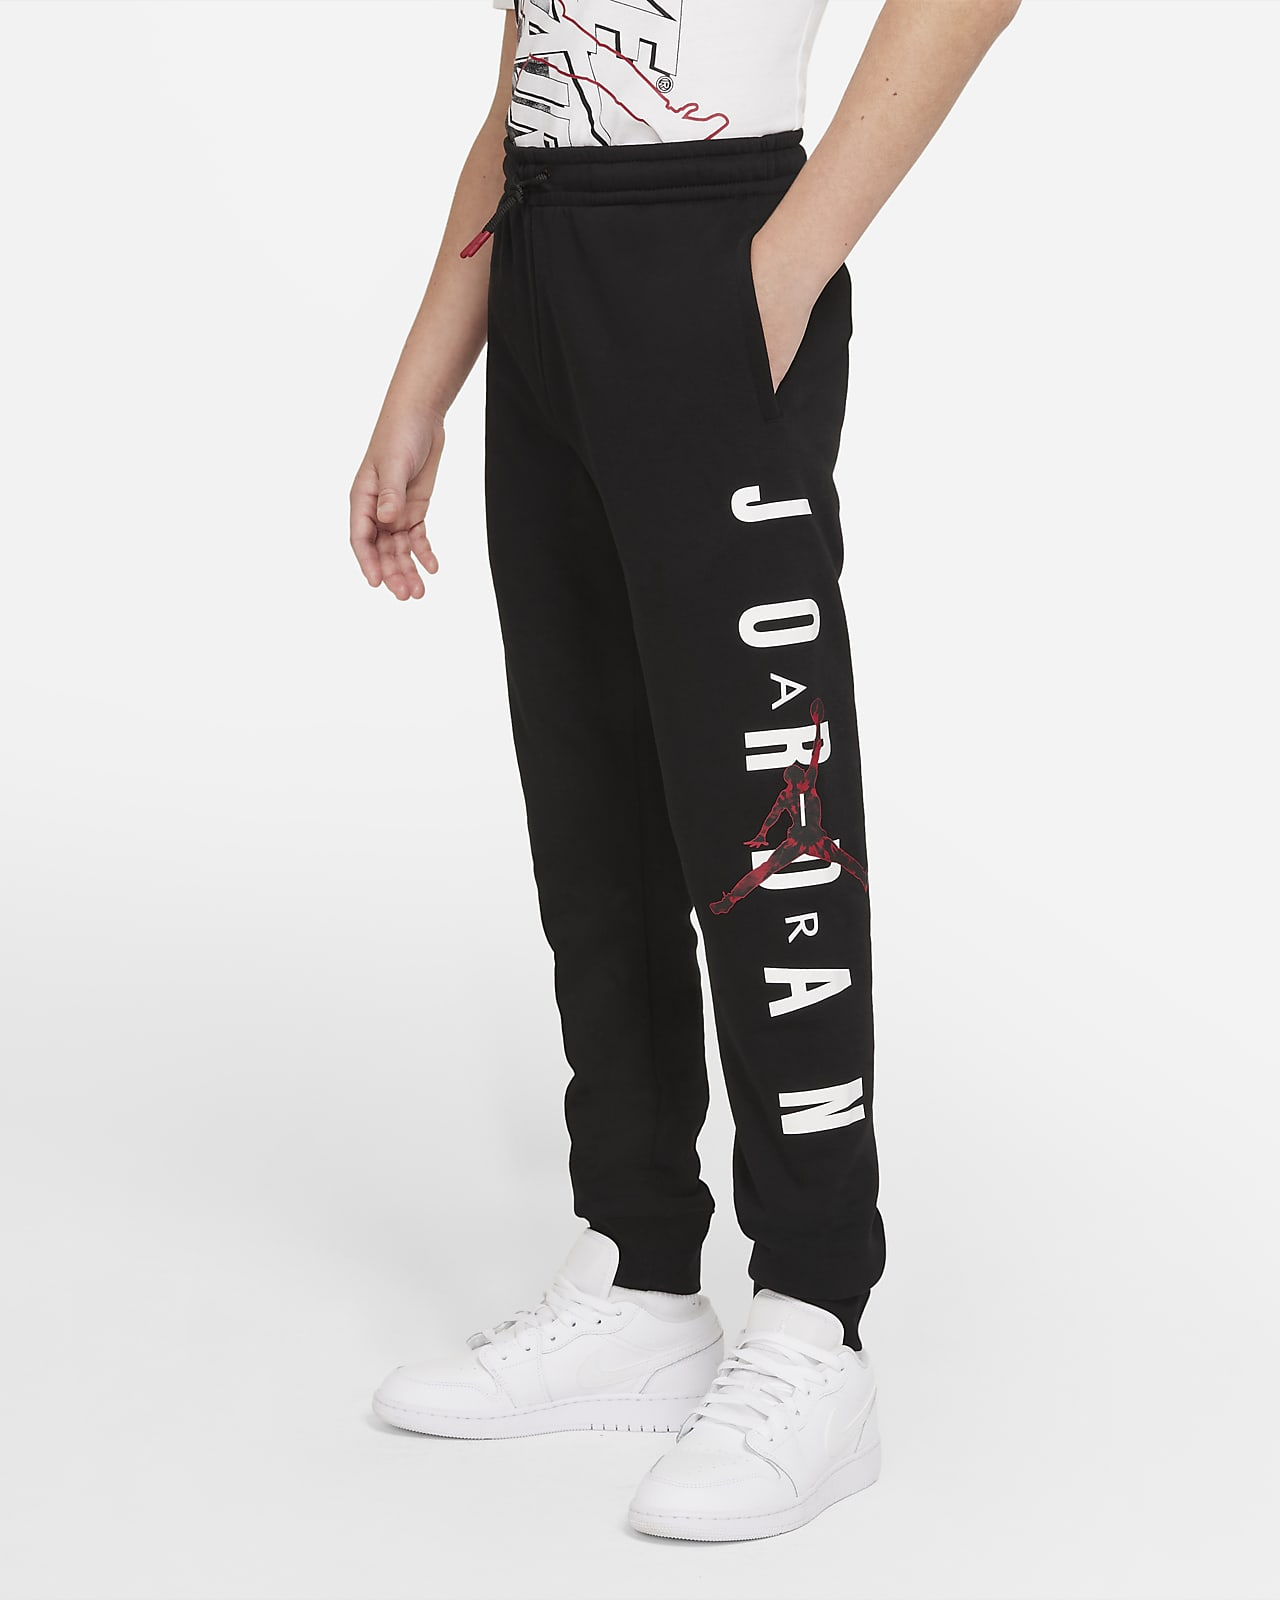 Jordan Big Kids' (Boys') Pants